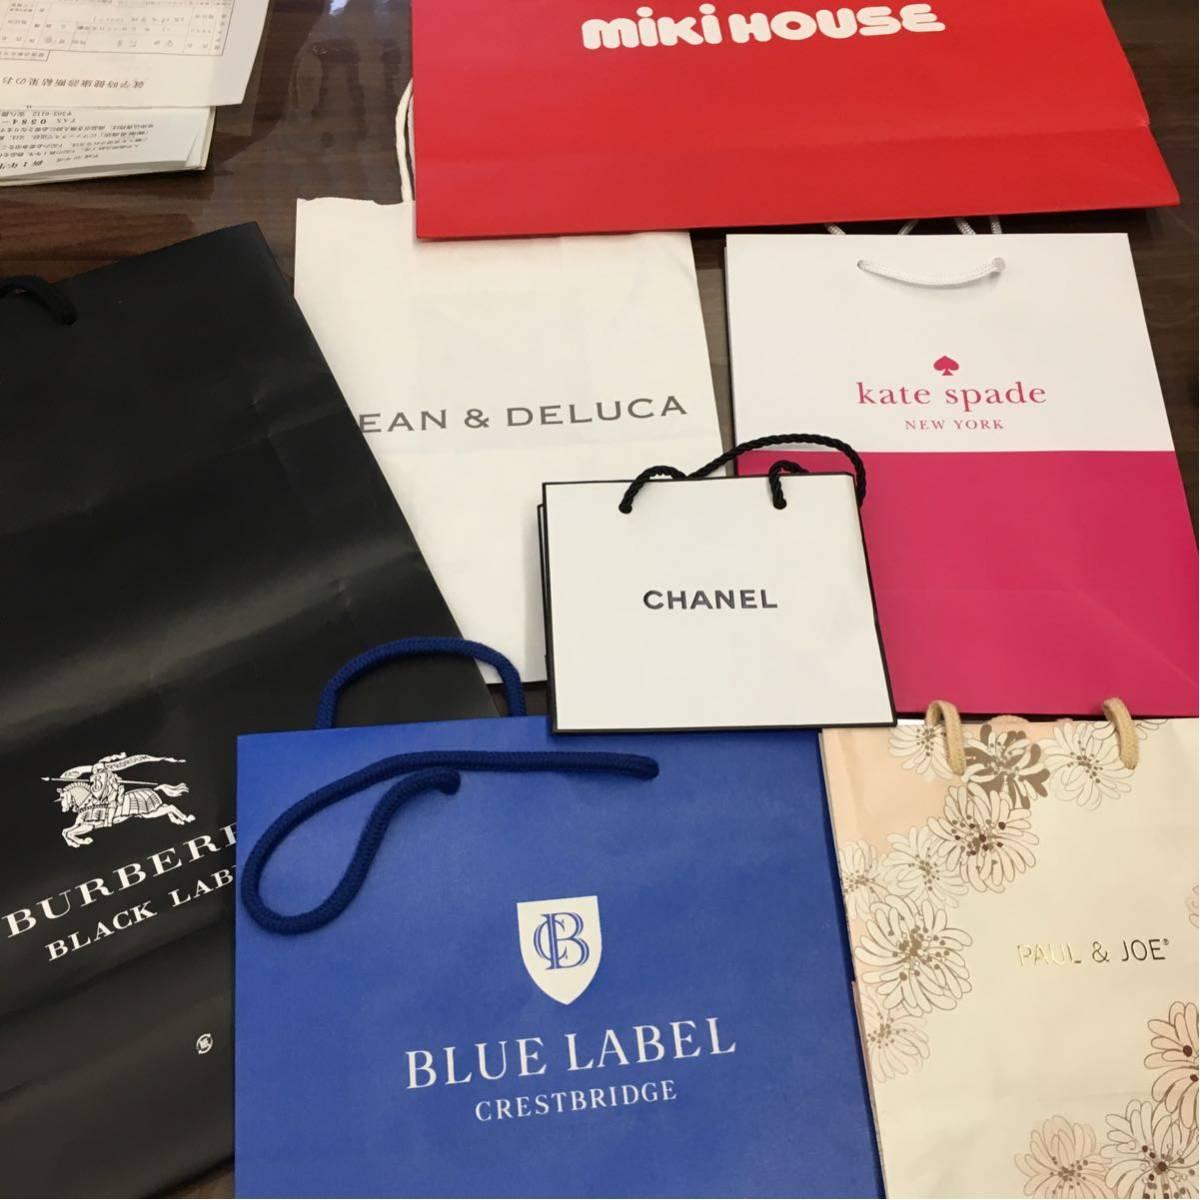 9ba52aff4e3eee brand shopa- paper bag shop sack set sale set Chanel Kate Spade Miki House  Paul & Joe Burberry Black Label